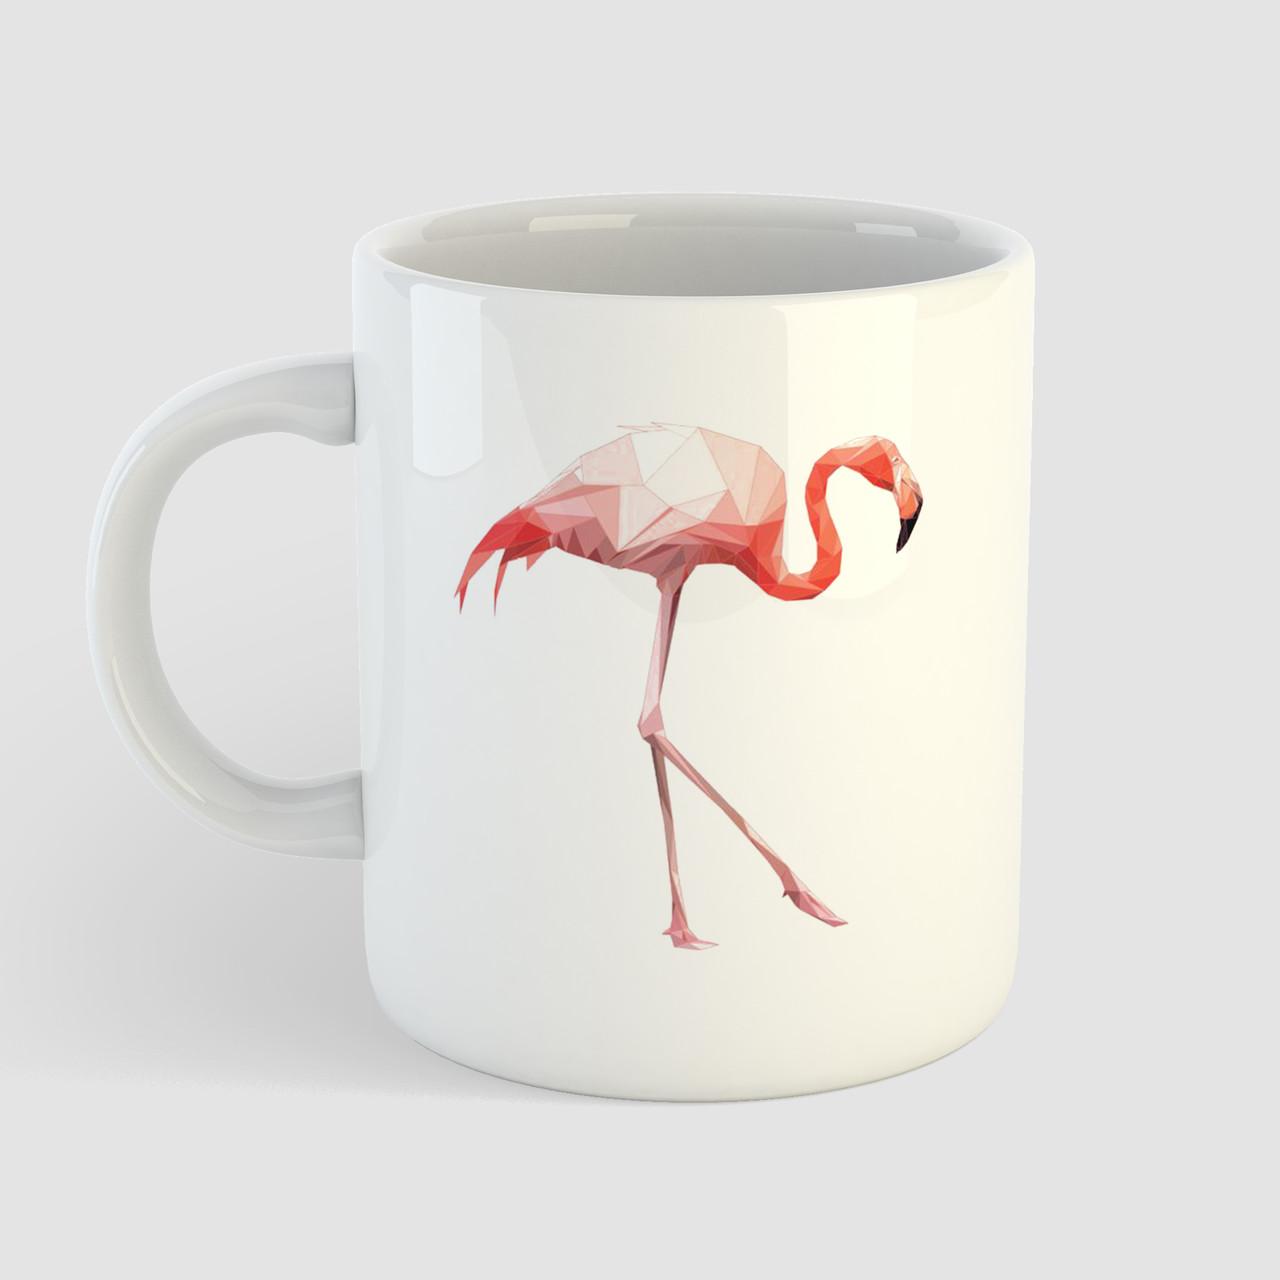 Кружка с принтом Фламинго. Птица. Чашка с фото